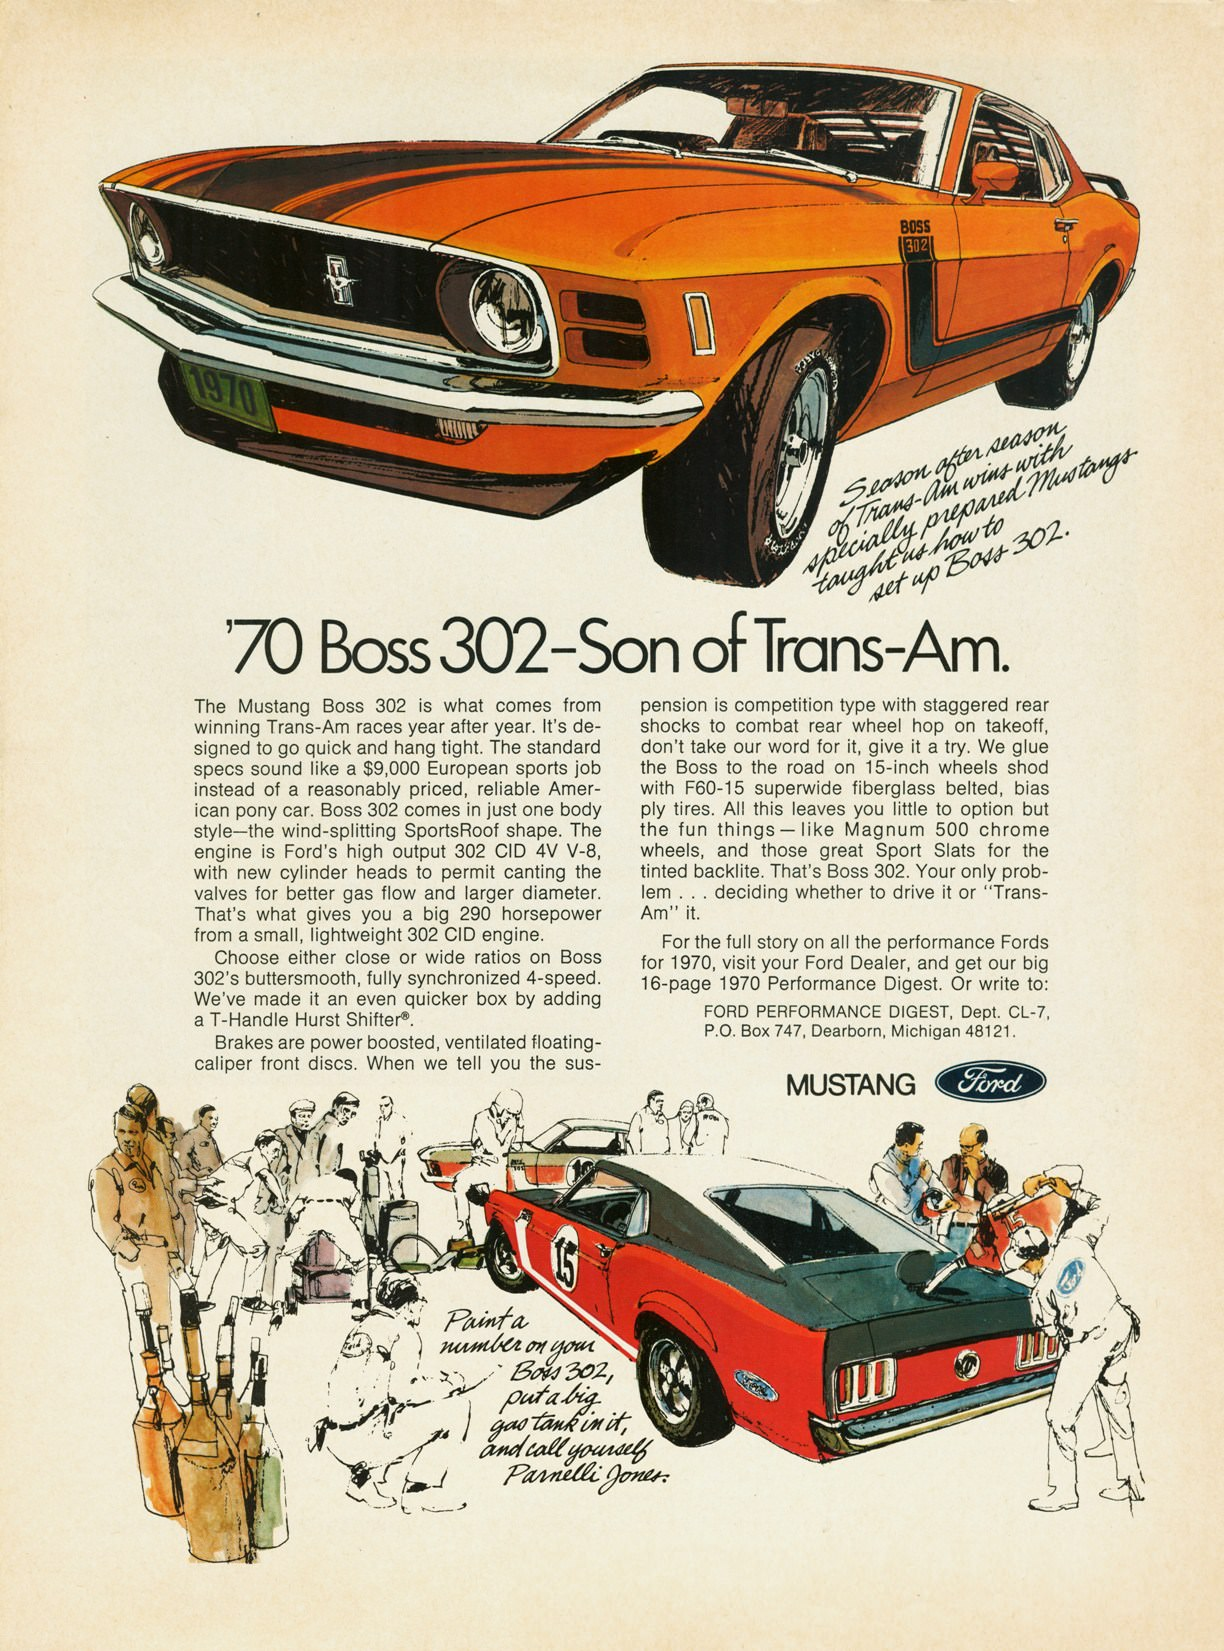 1970 Mustang 302 Poster